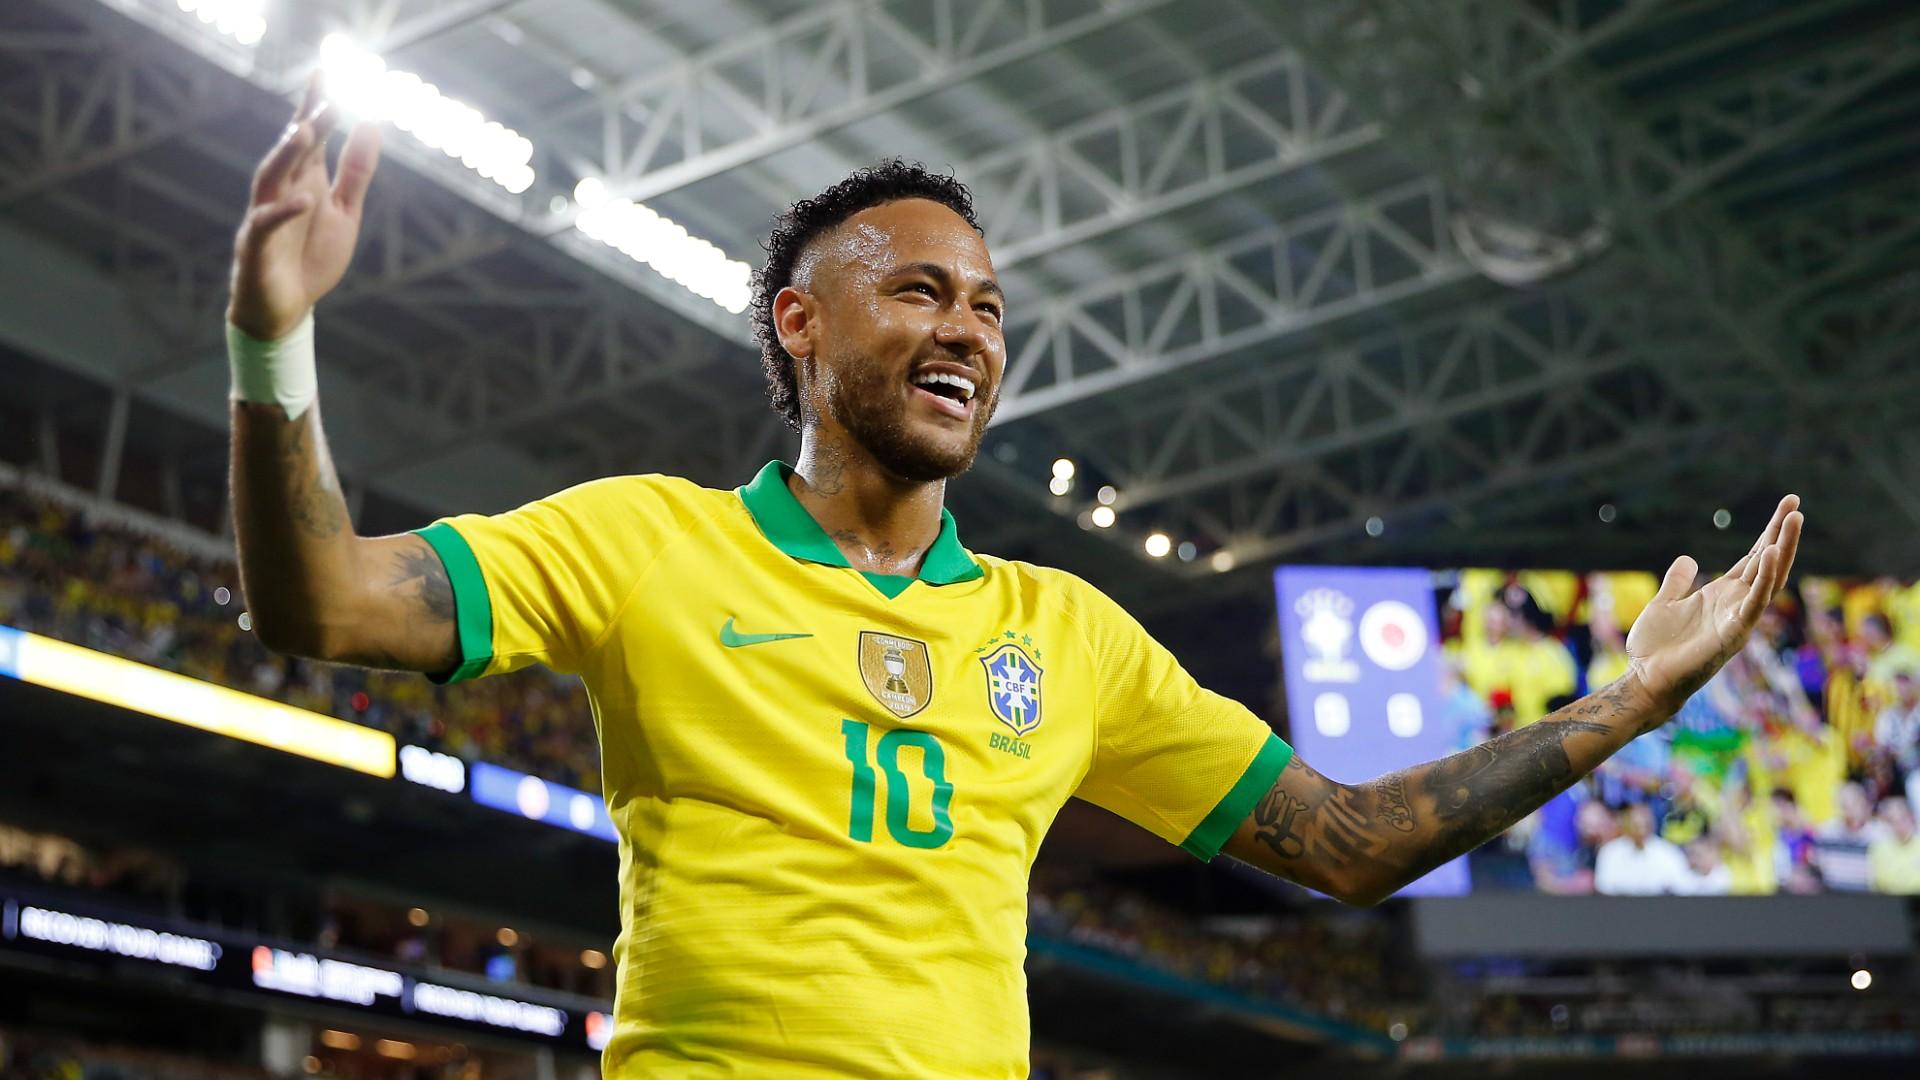 Brazil-International Friendlies-PSG-Ligue 1-برزیل-لیگ یک-پاری سن ژرمن-بازیهای دوستانه ملی